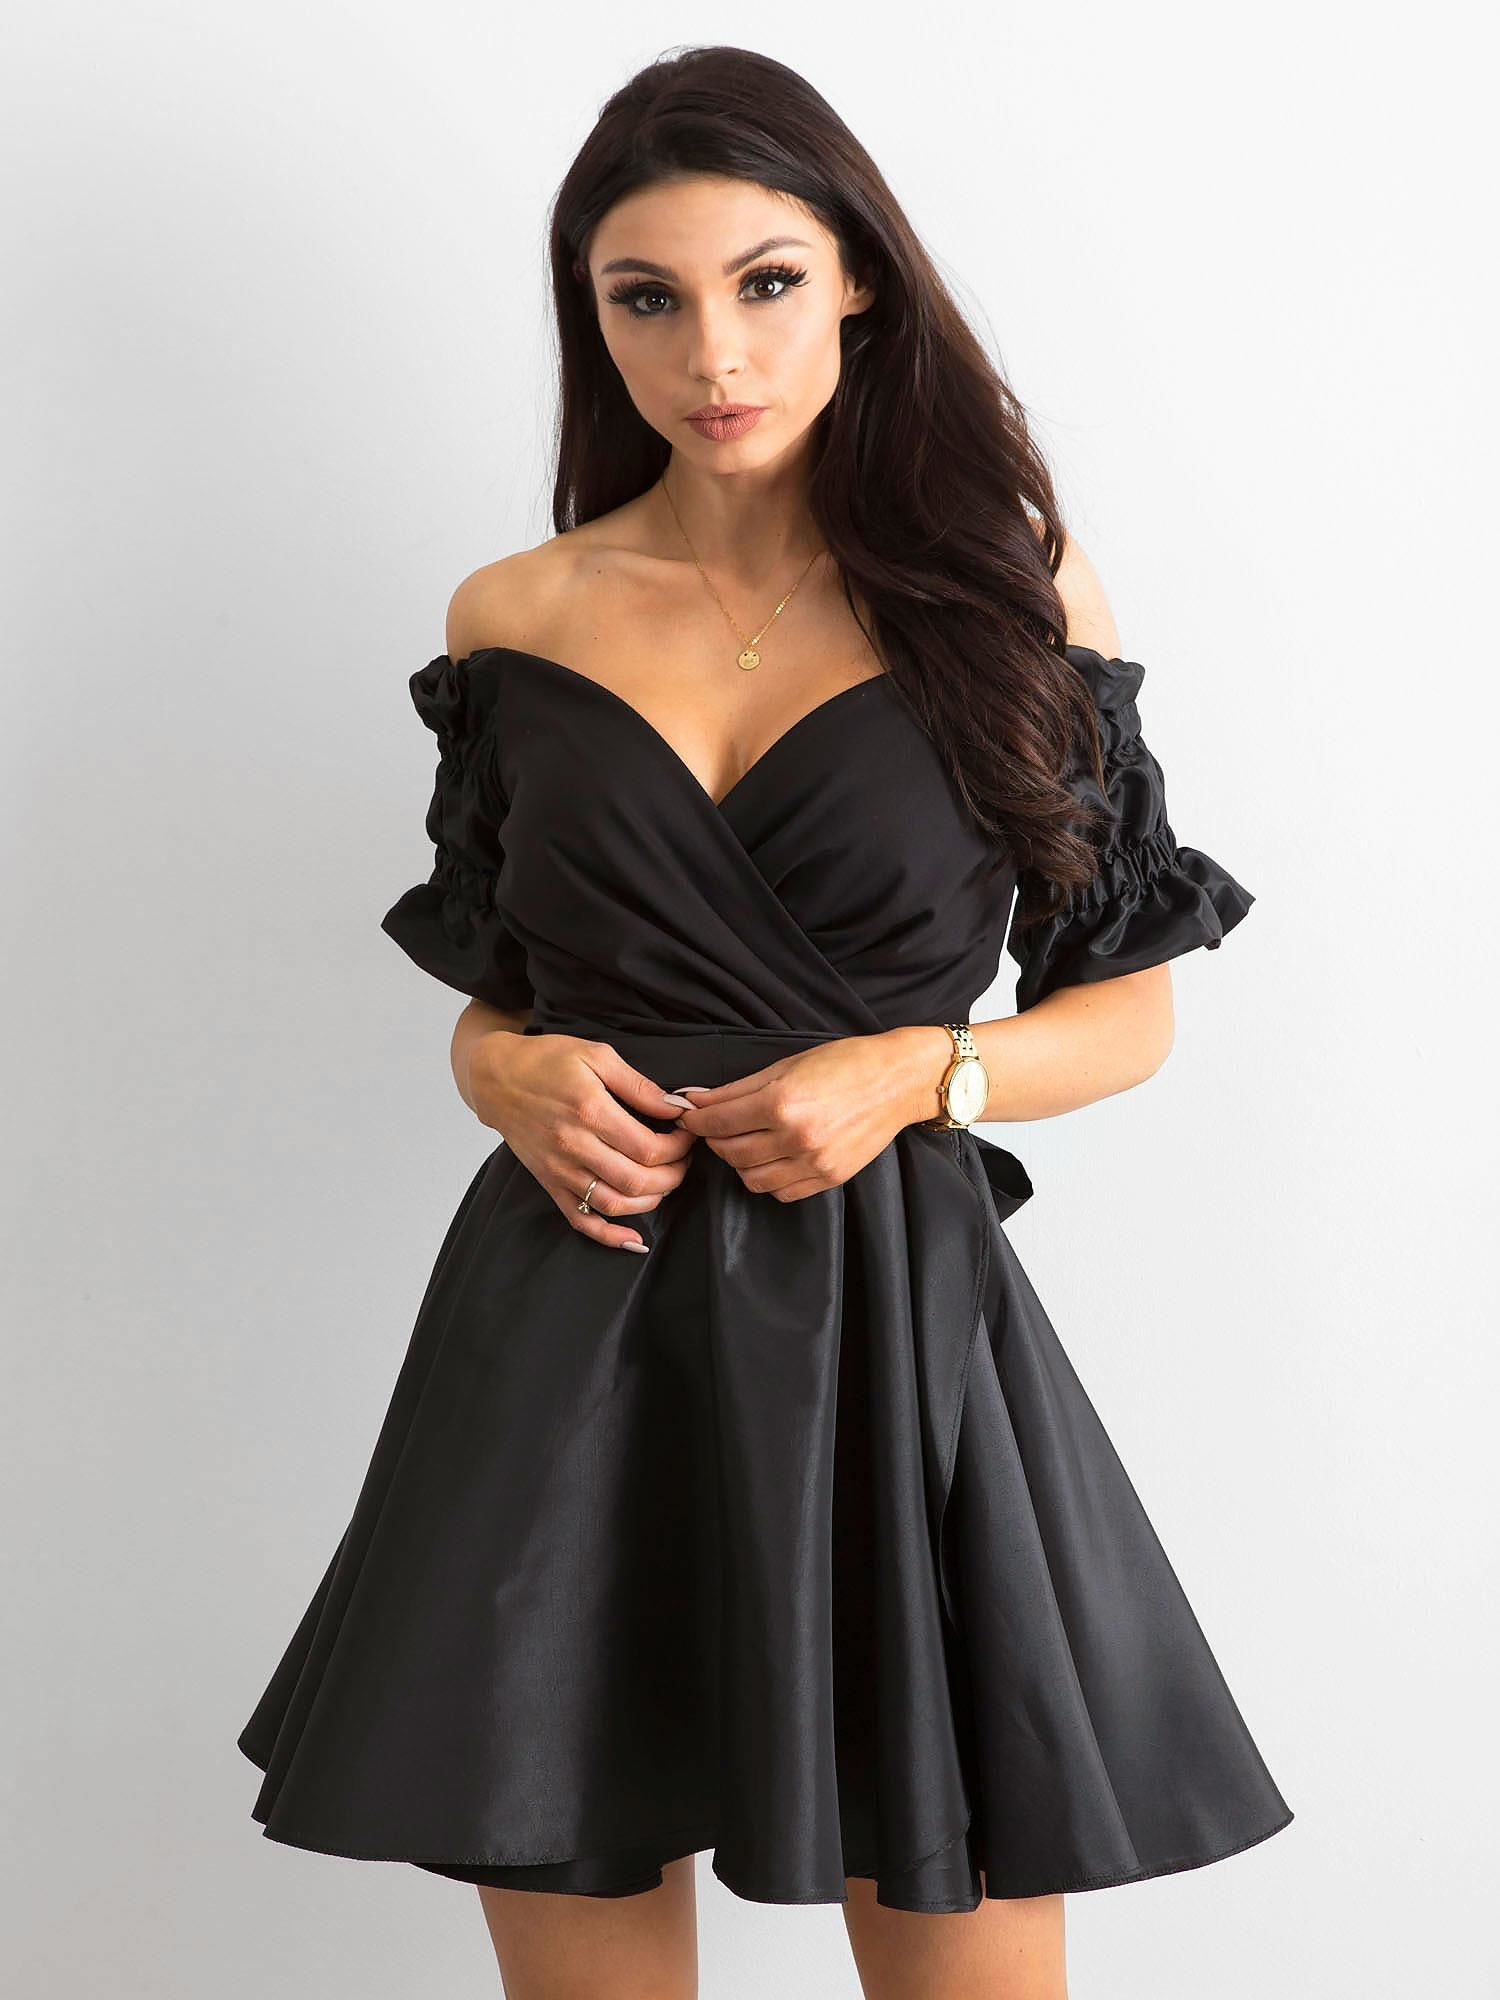 1d3408c3e2 Rozkloszowana sukienka czarna BY O LA LA - Sukienka rozkloszowana ...